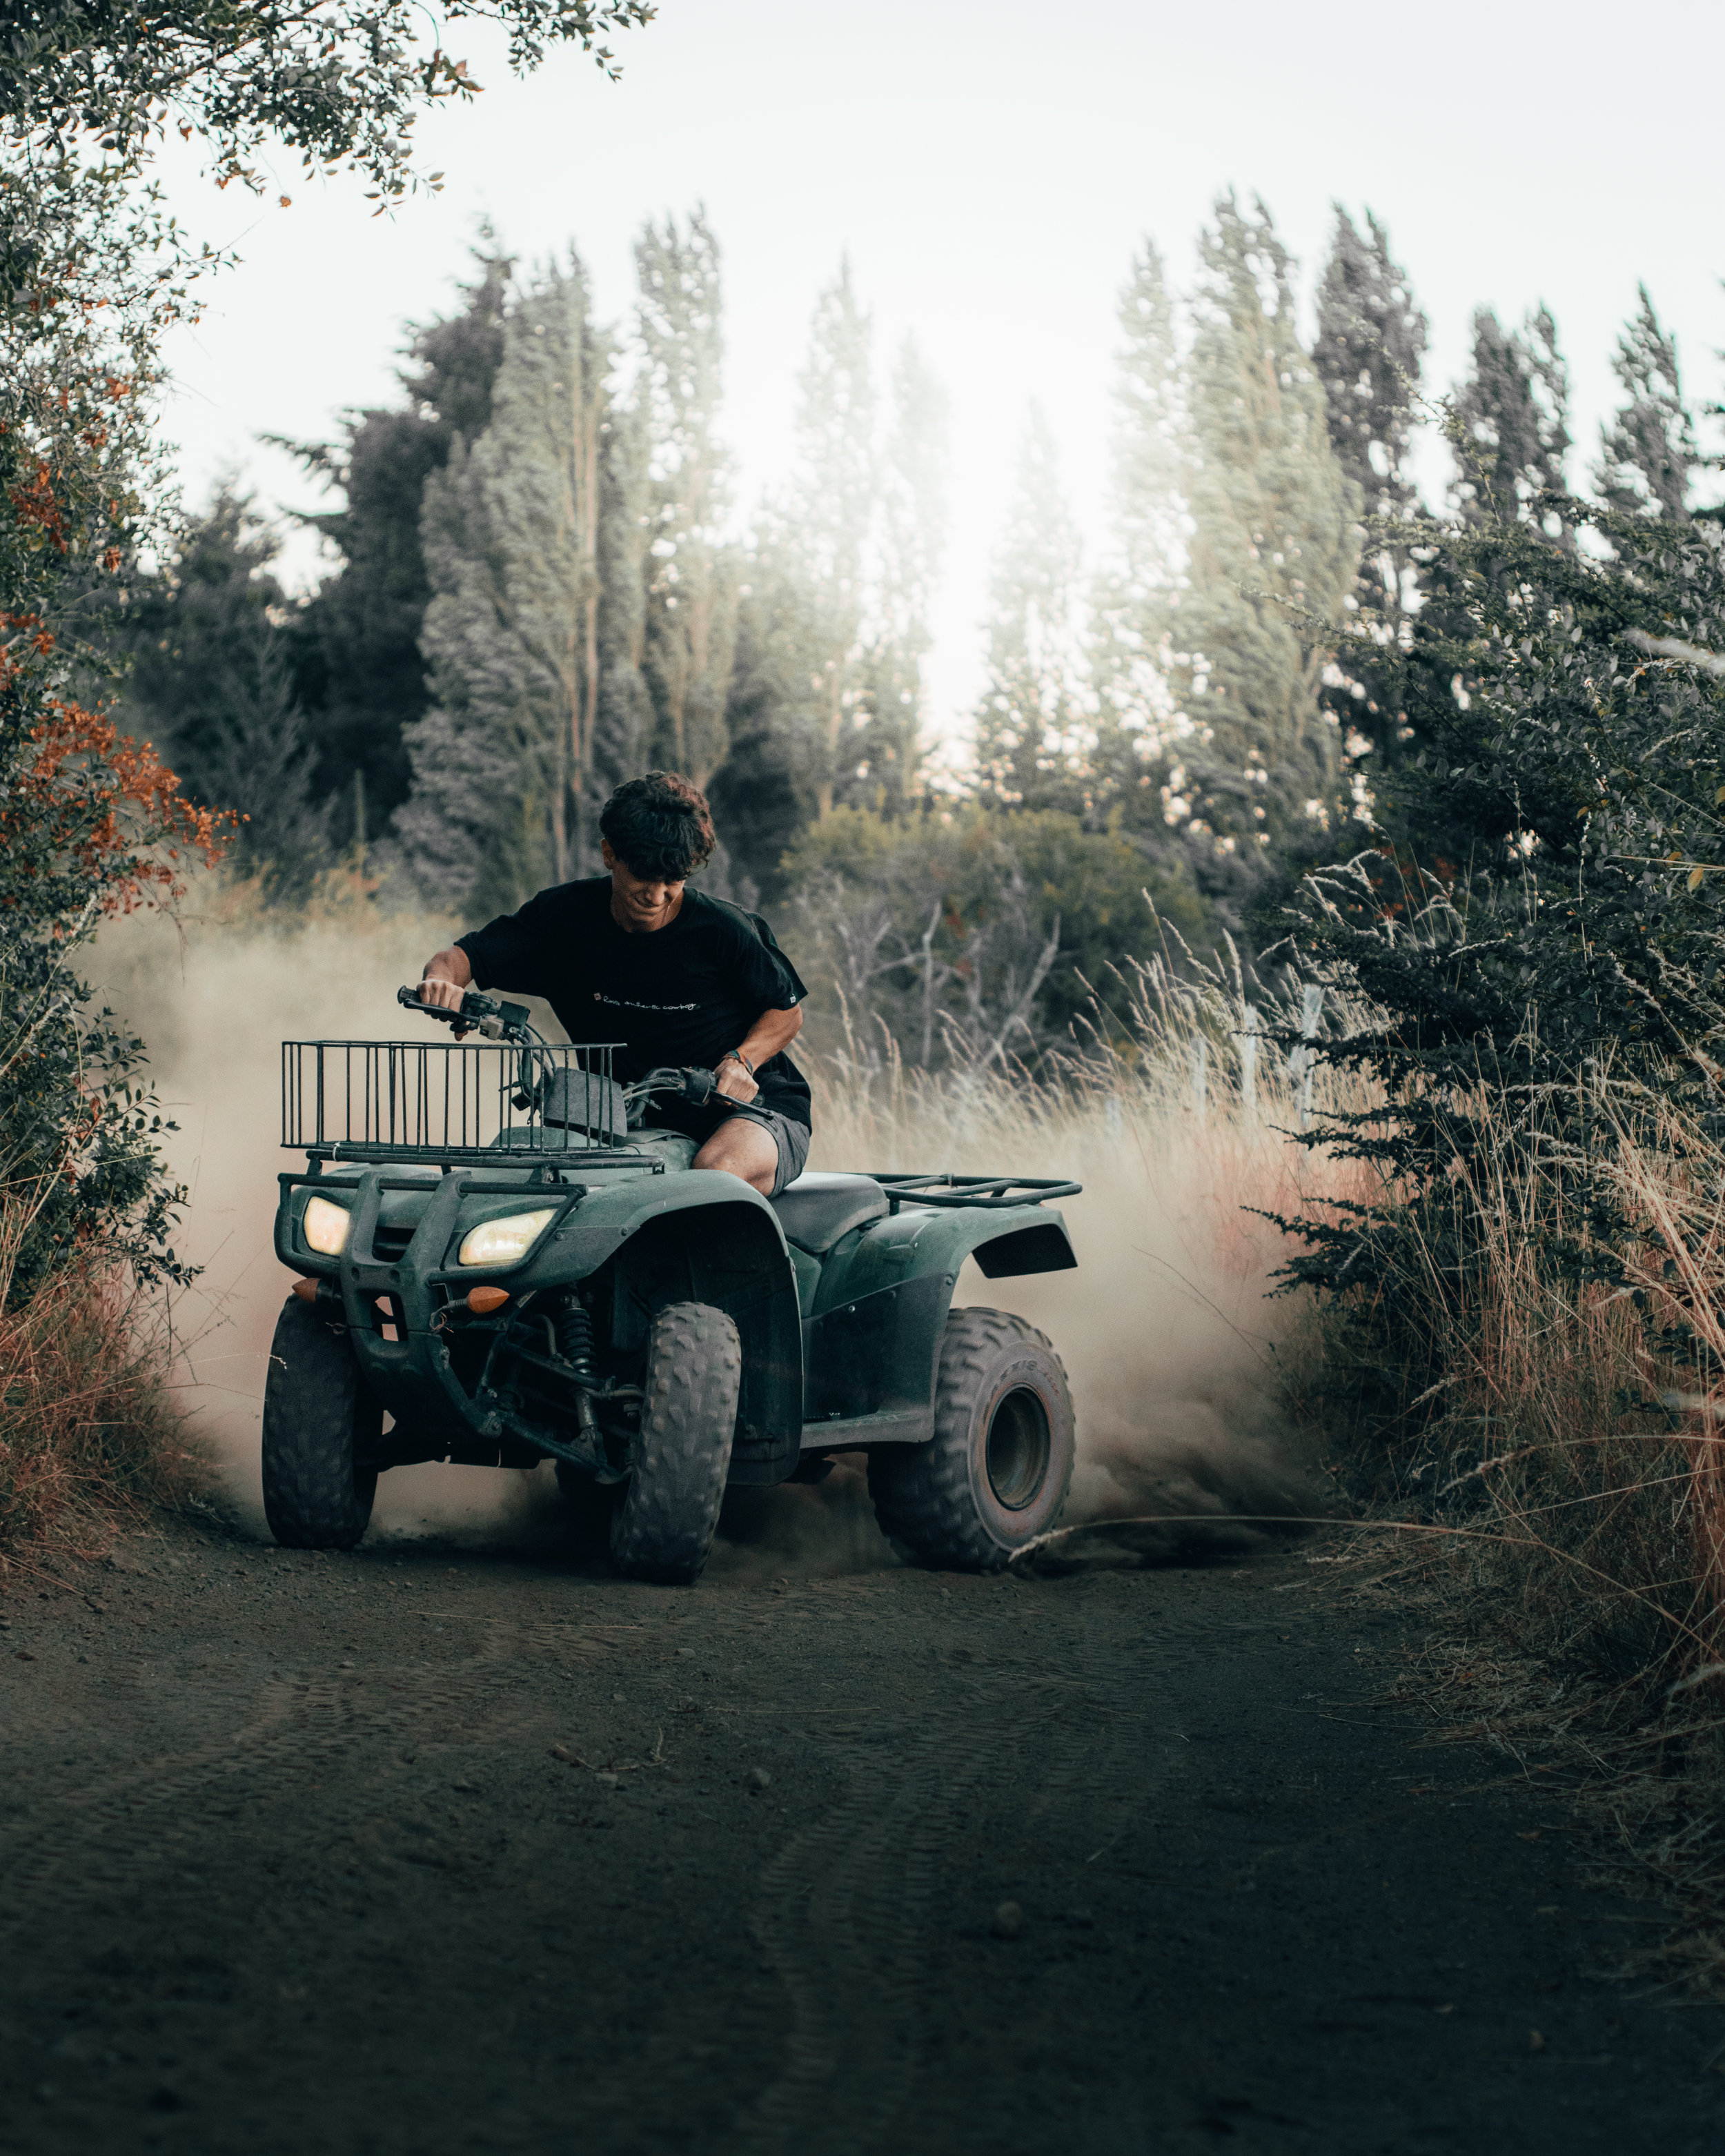 ATV, 4 Wheeler's plus other recreational vehicles!